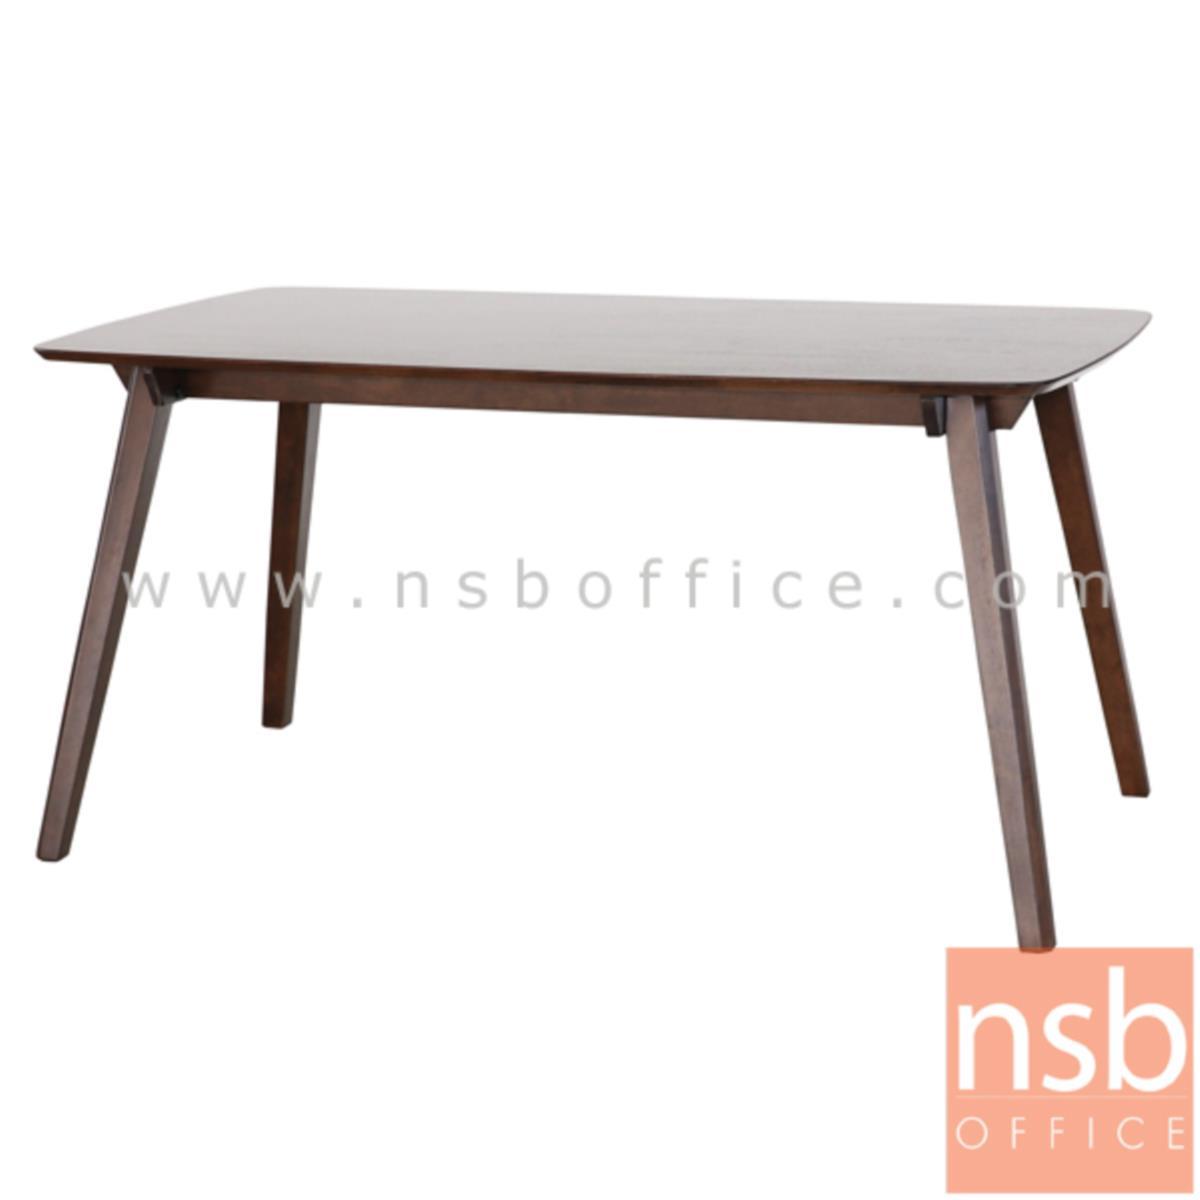 G14A135:โต๊ะรับประทานอาหารหน้าไม้ รุ่น Plant (แพลนต์) ขนาด 147W cm.